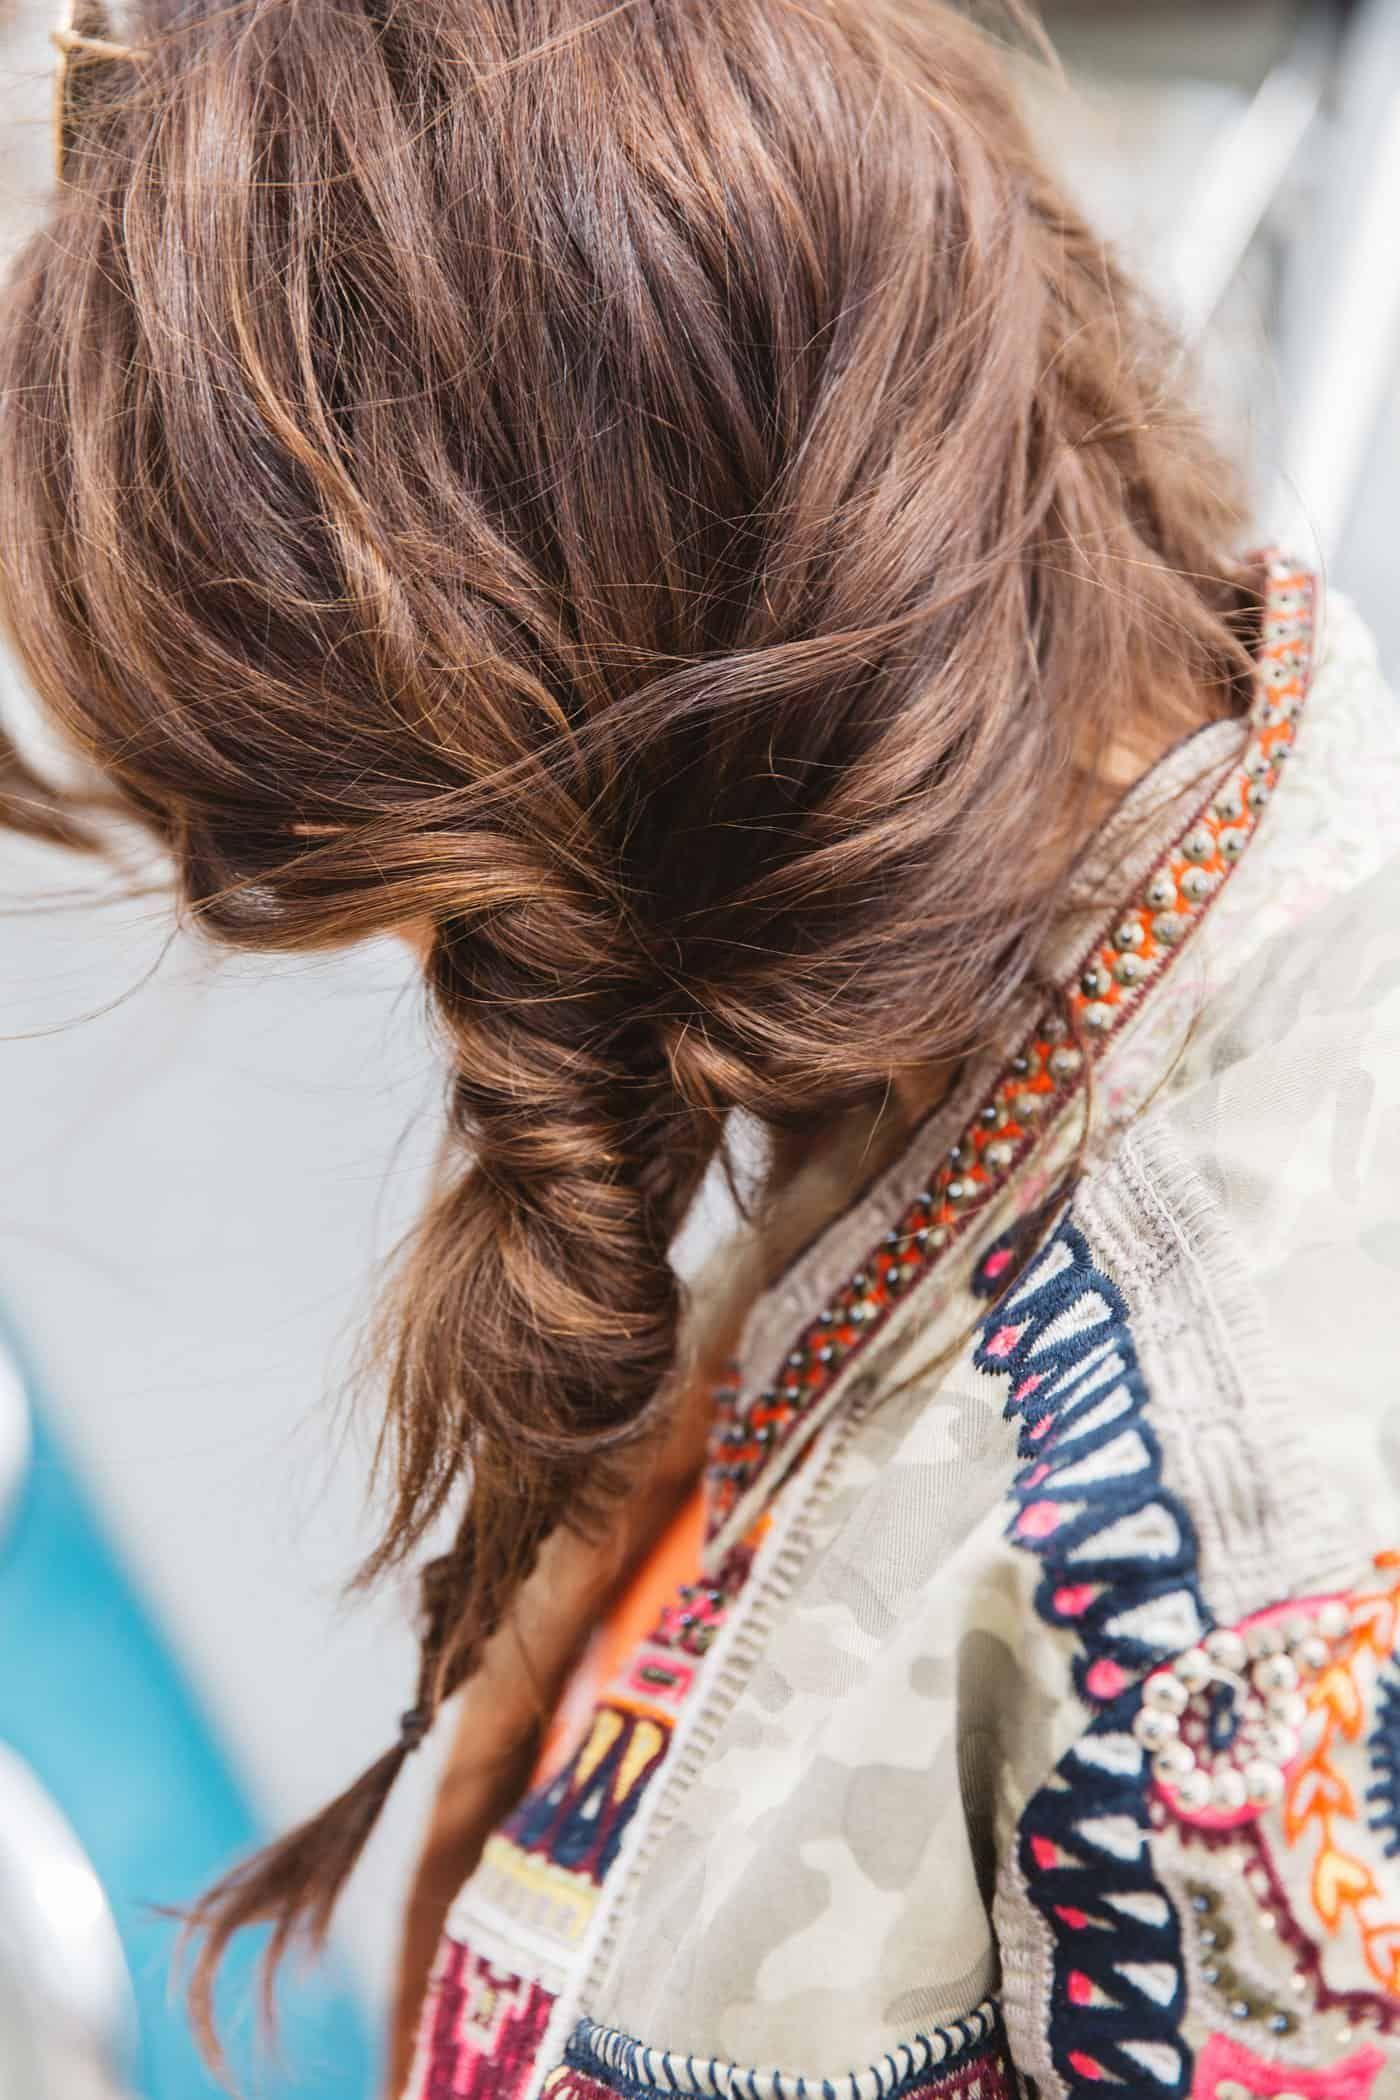 Summer Days • California Casual | California casual, Fish tail braid, Summer days